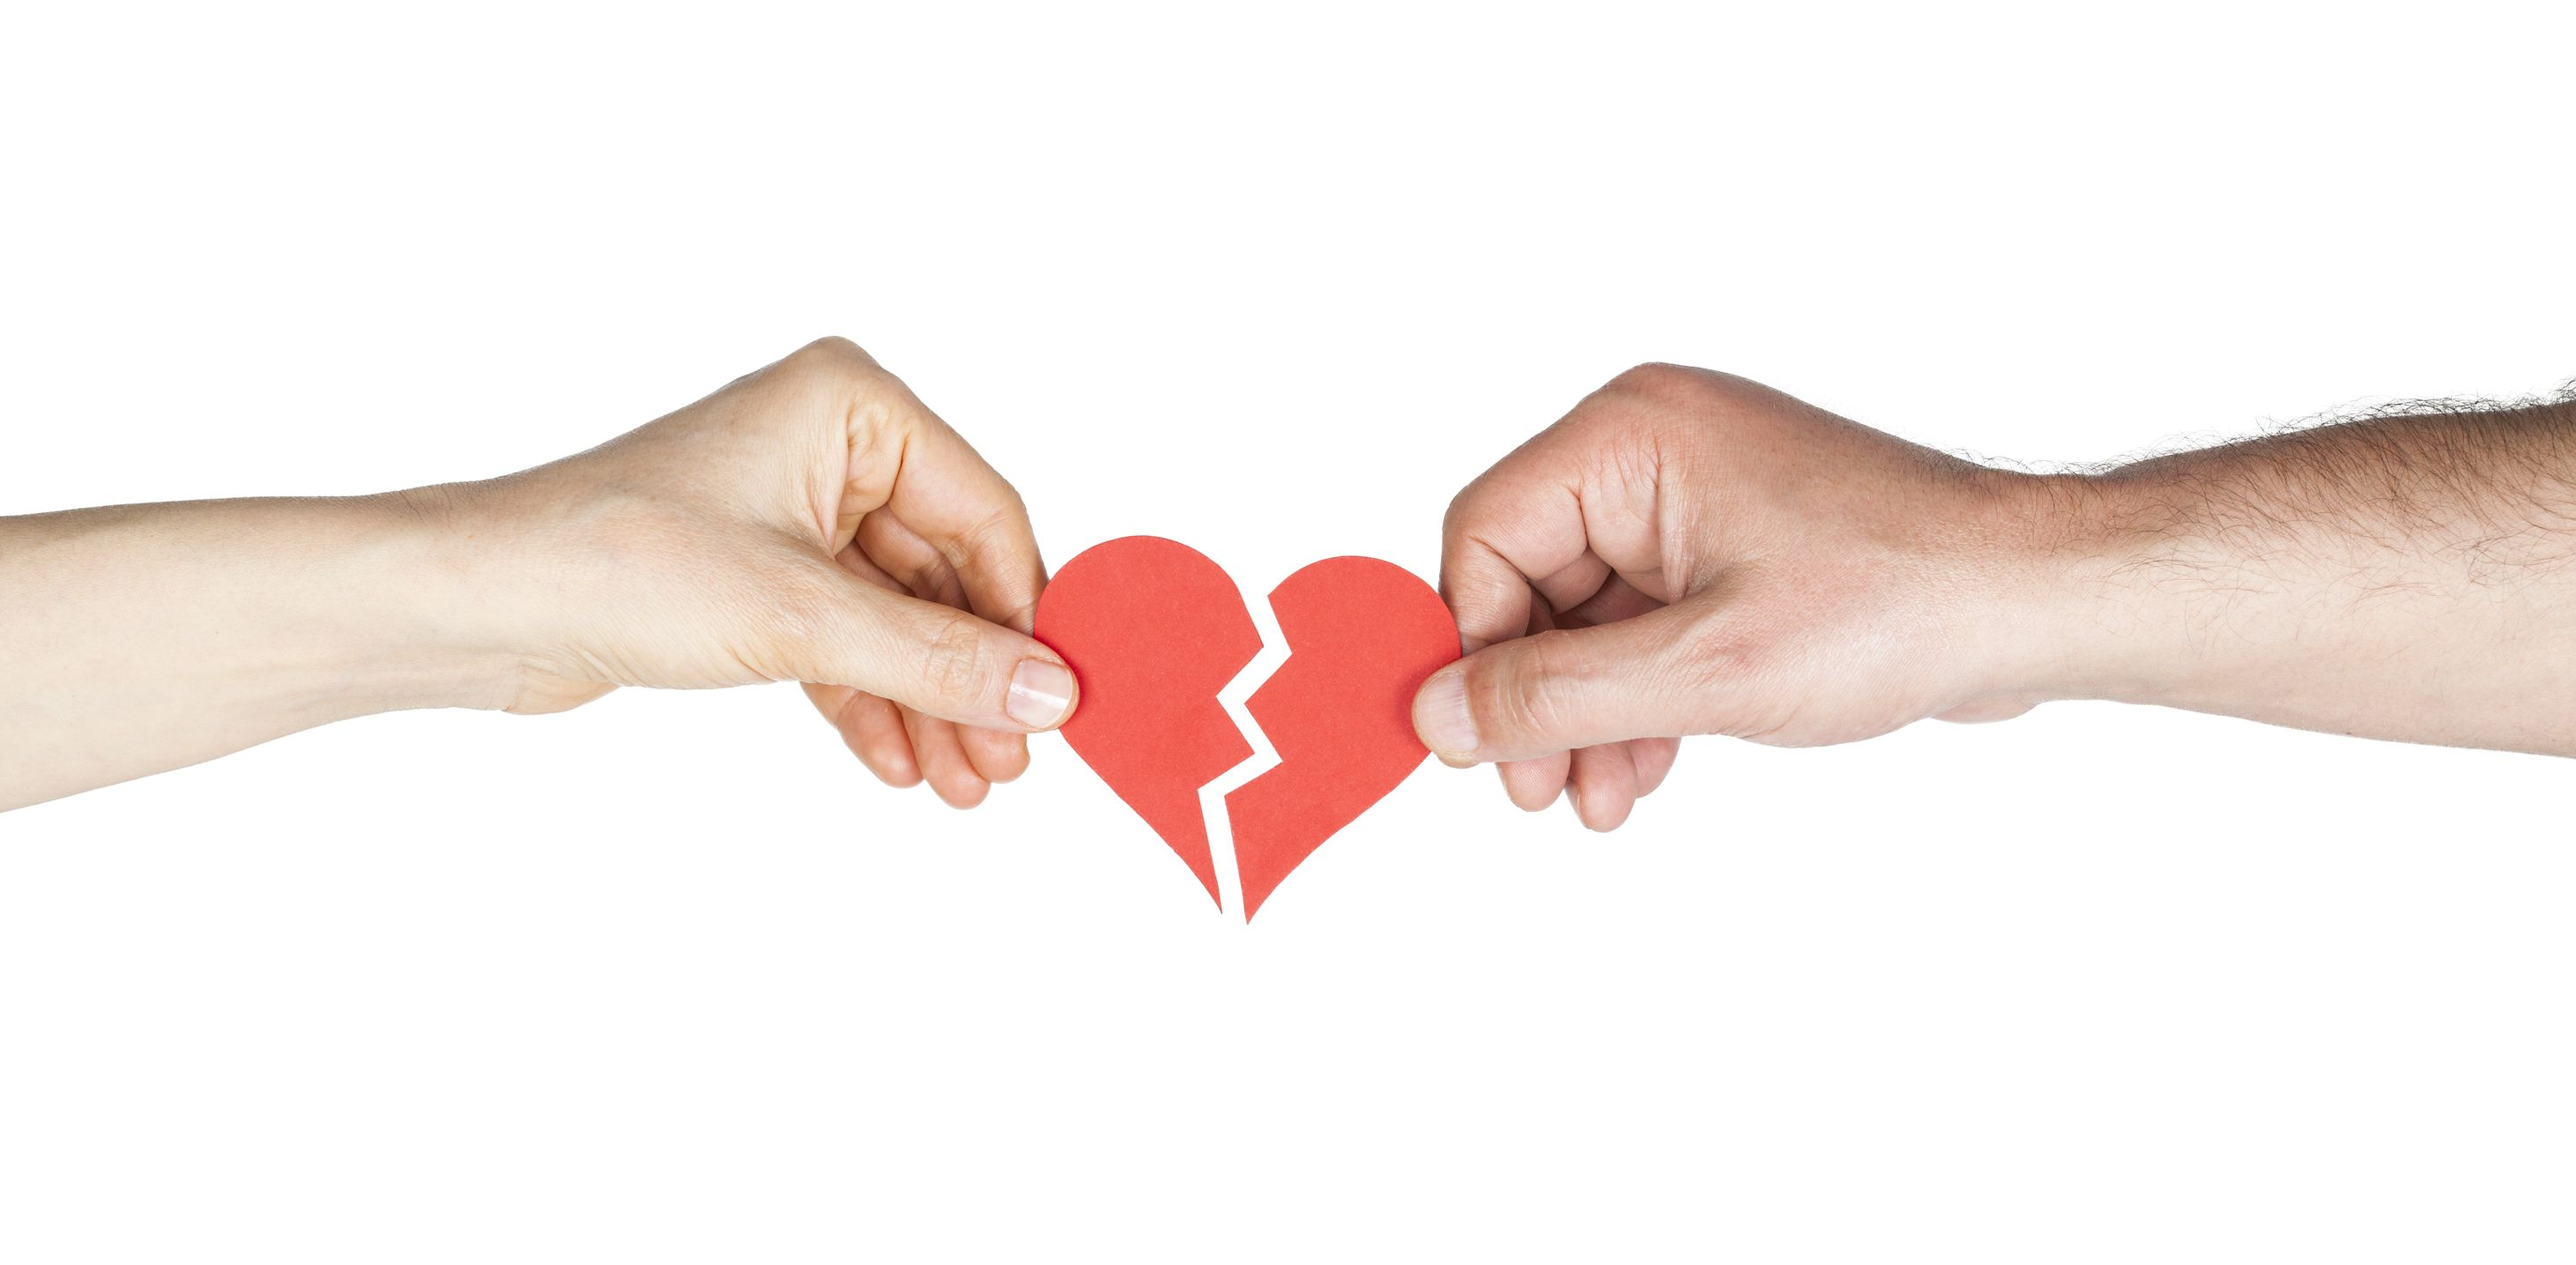 18019954 - man and woman hands holding broken heart